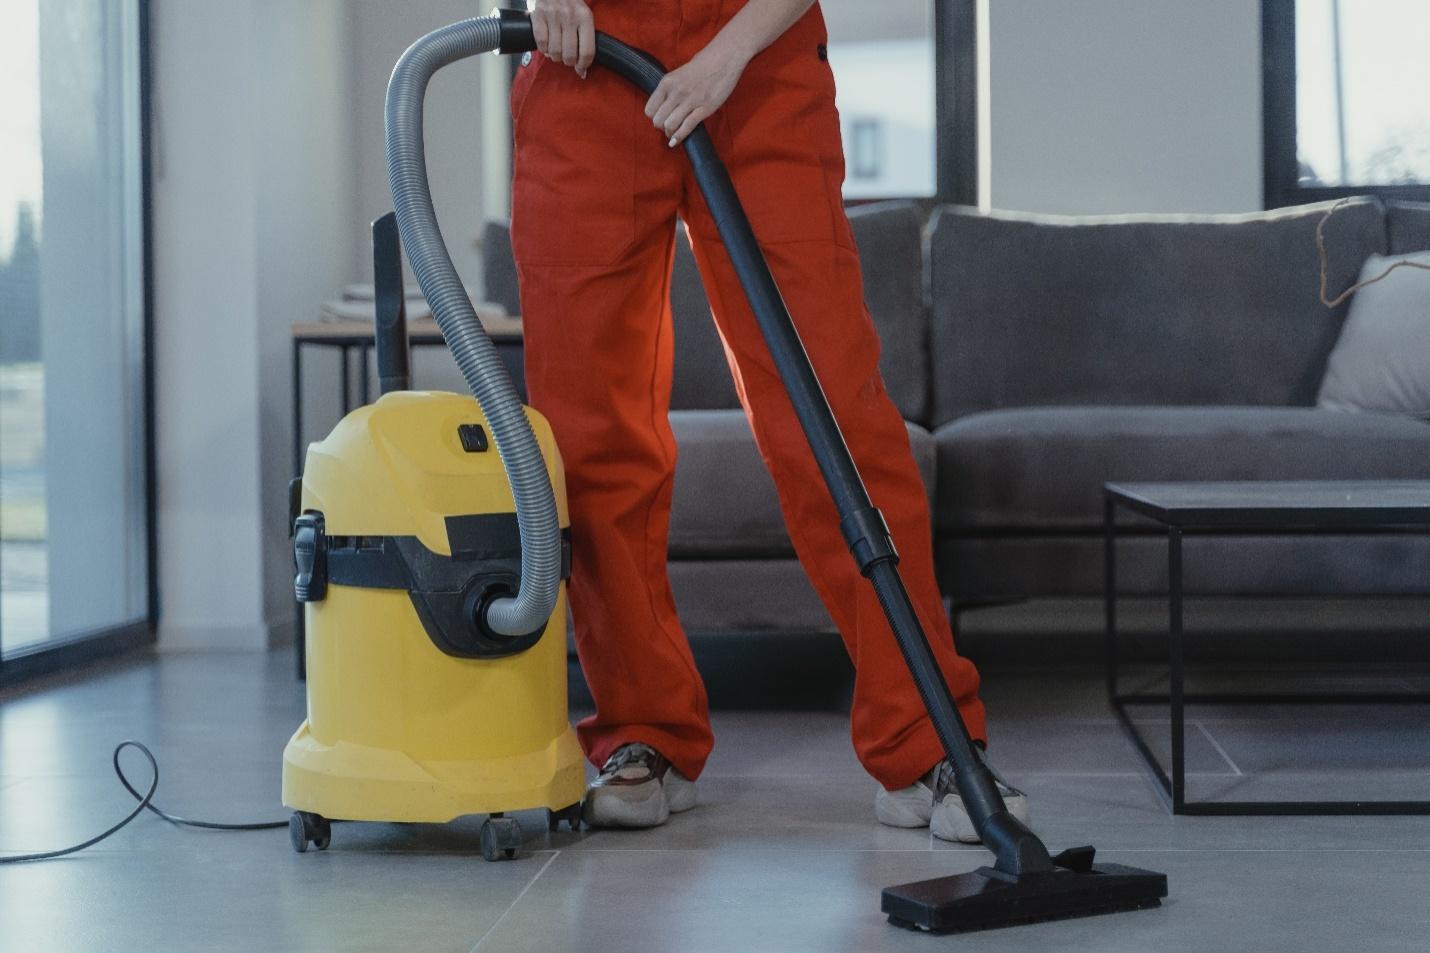 vacuuming tiled floors